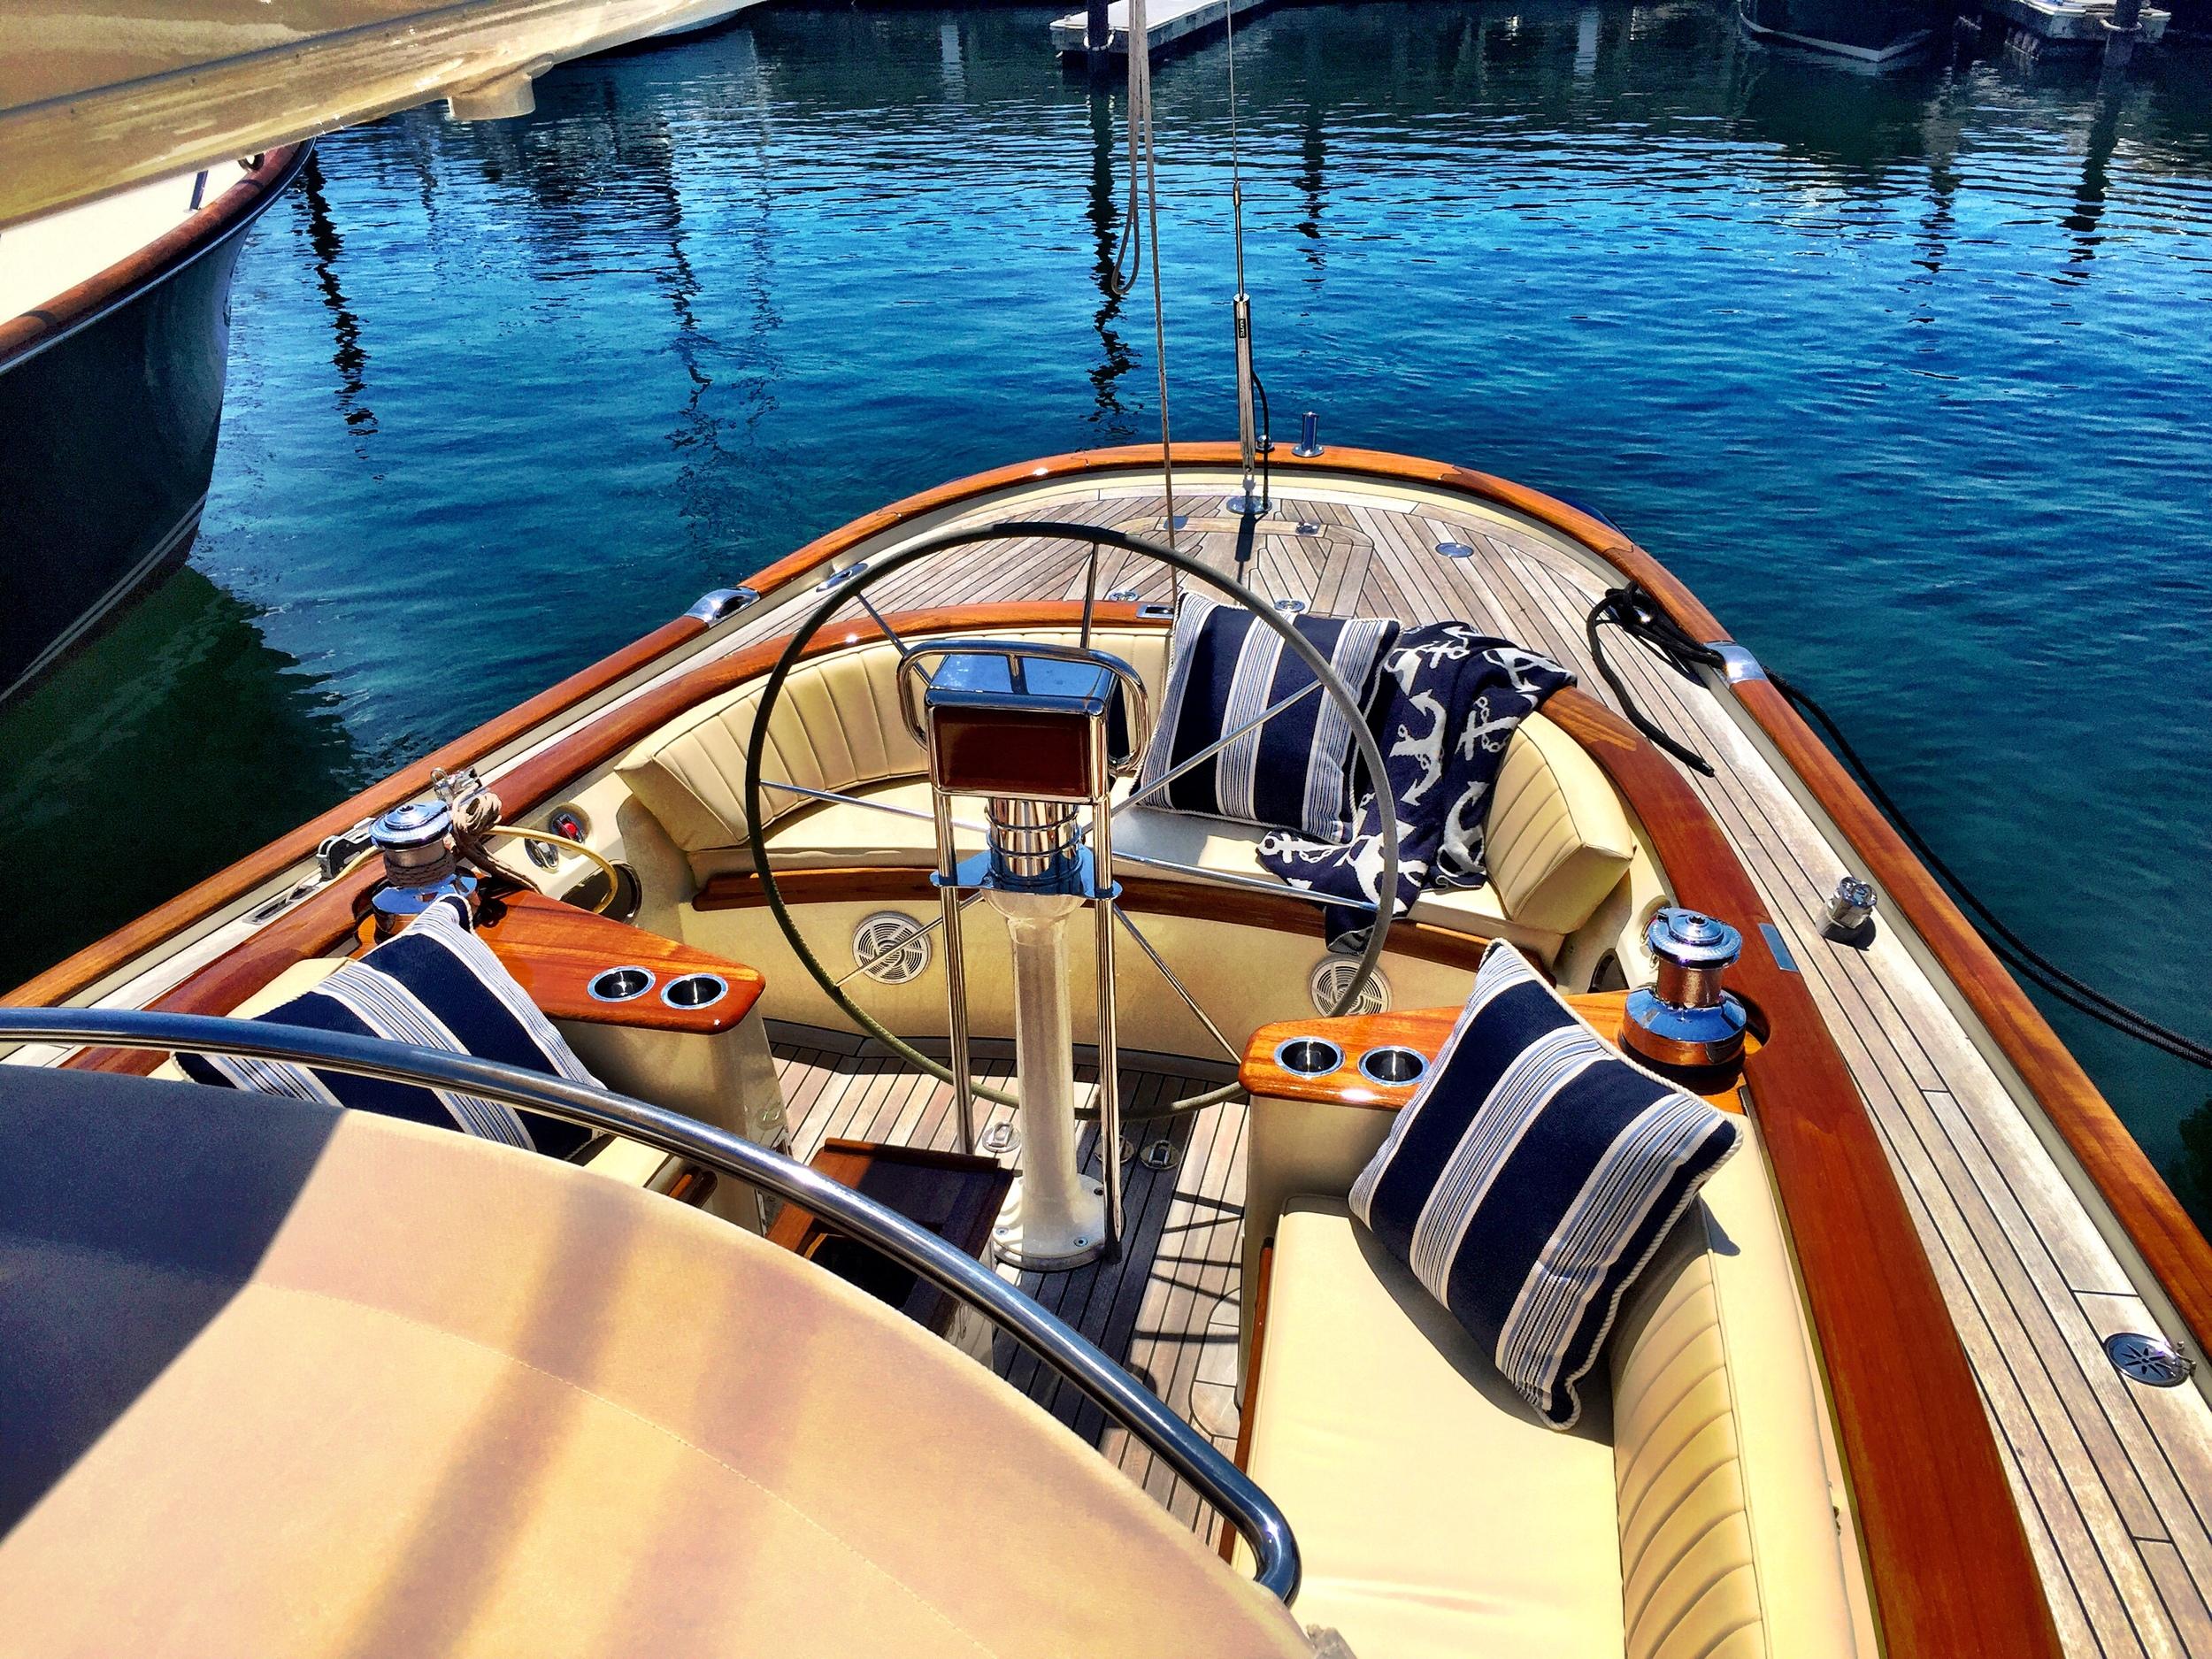 Maloney_Interiors_Boat_Cushions_Upholstery_Connecticut_Massachusetts_Rhoe_Island.JPG